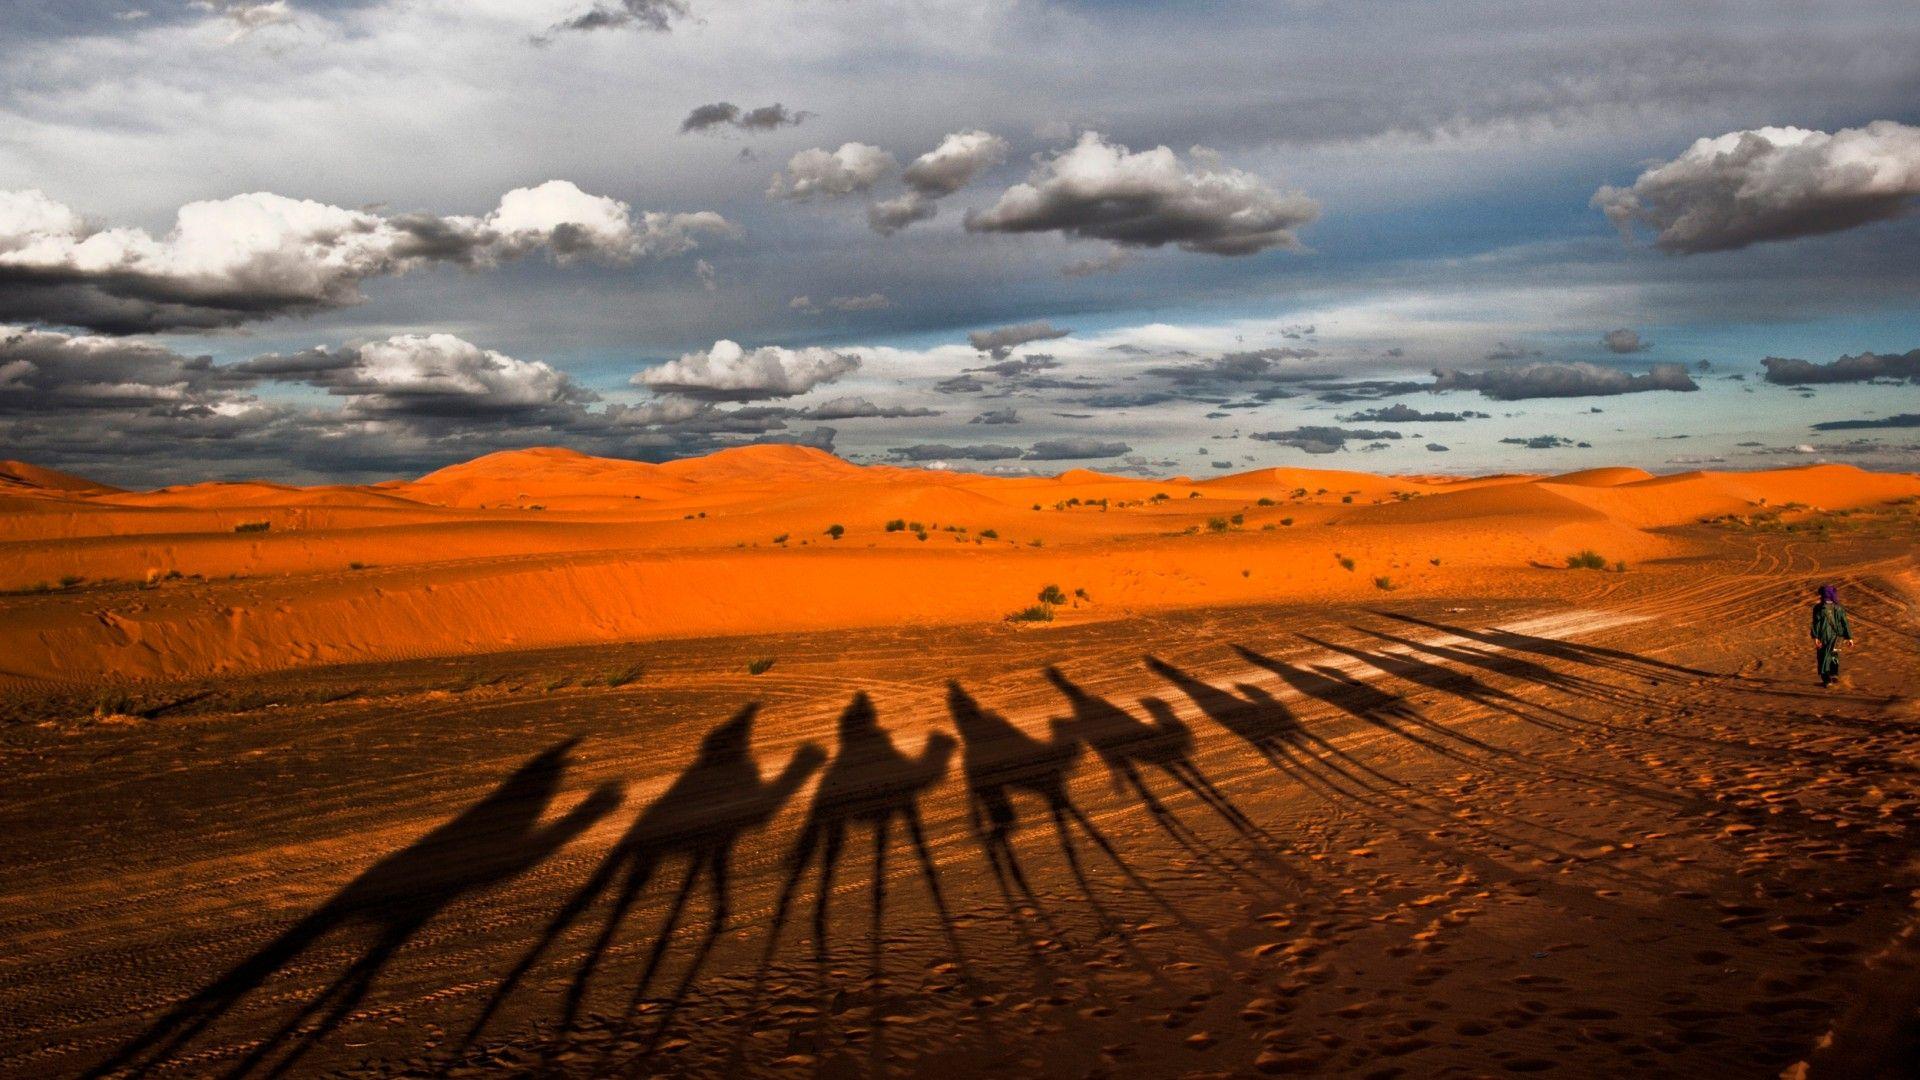 Desert Hd Photo